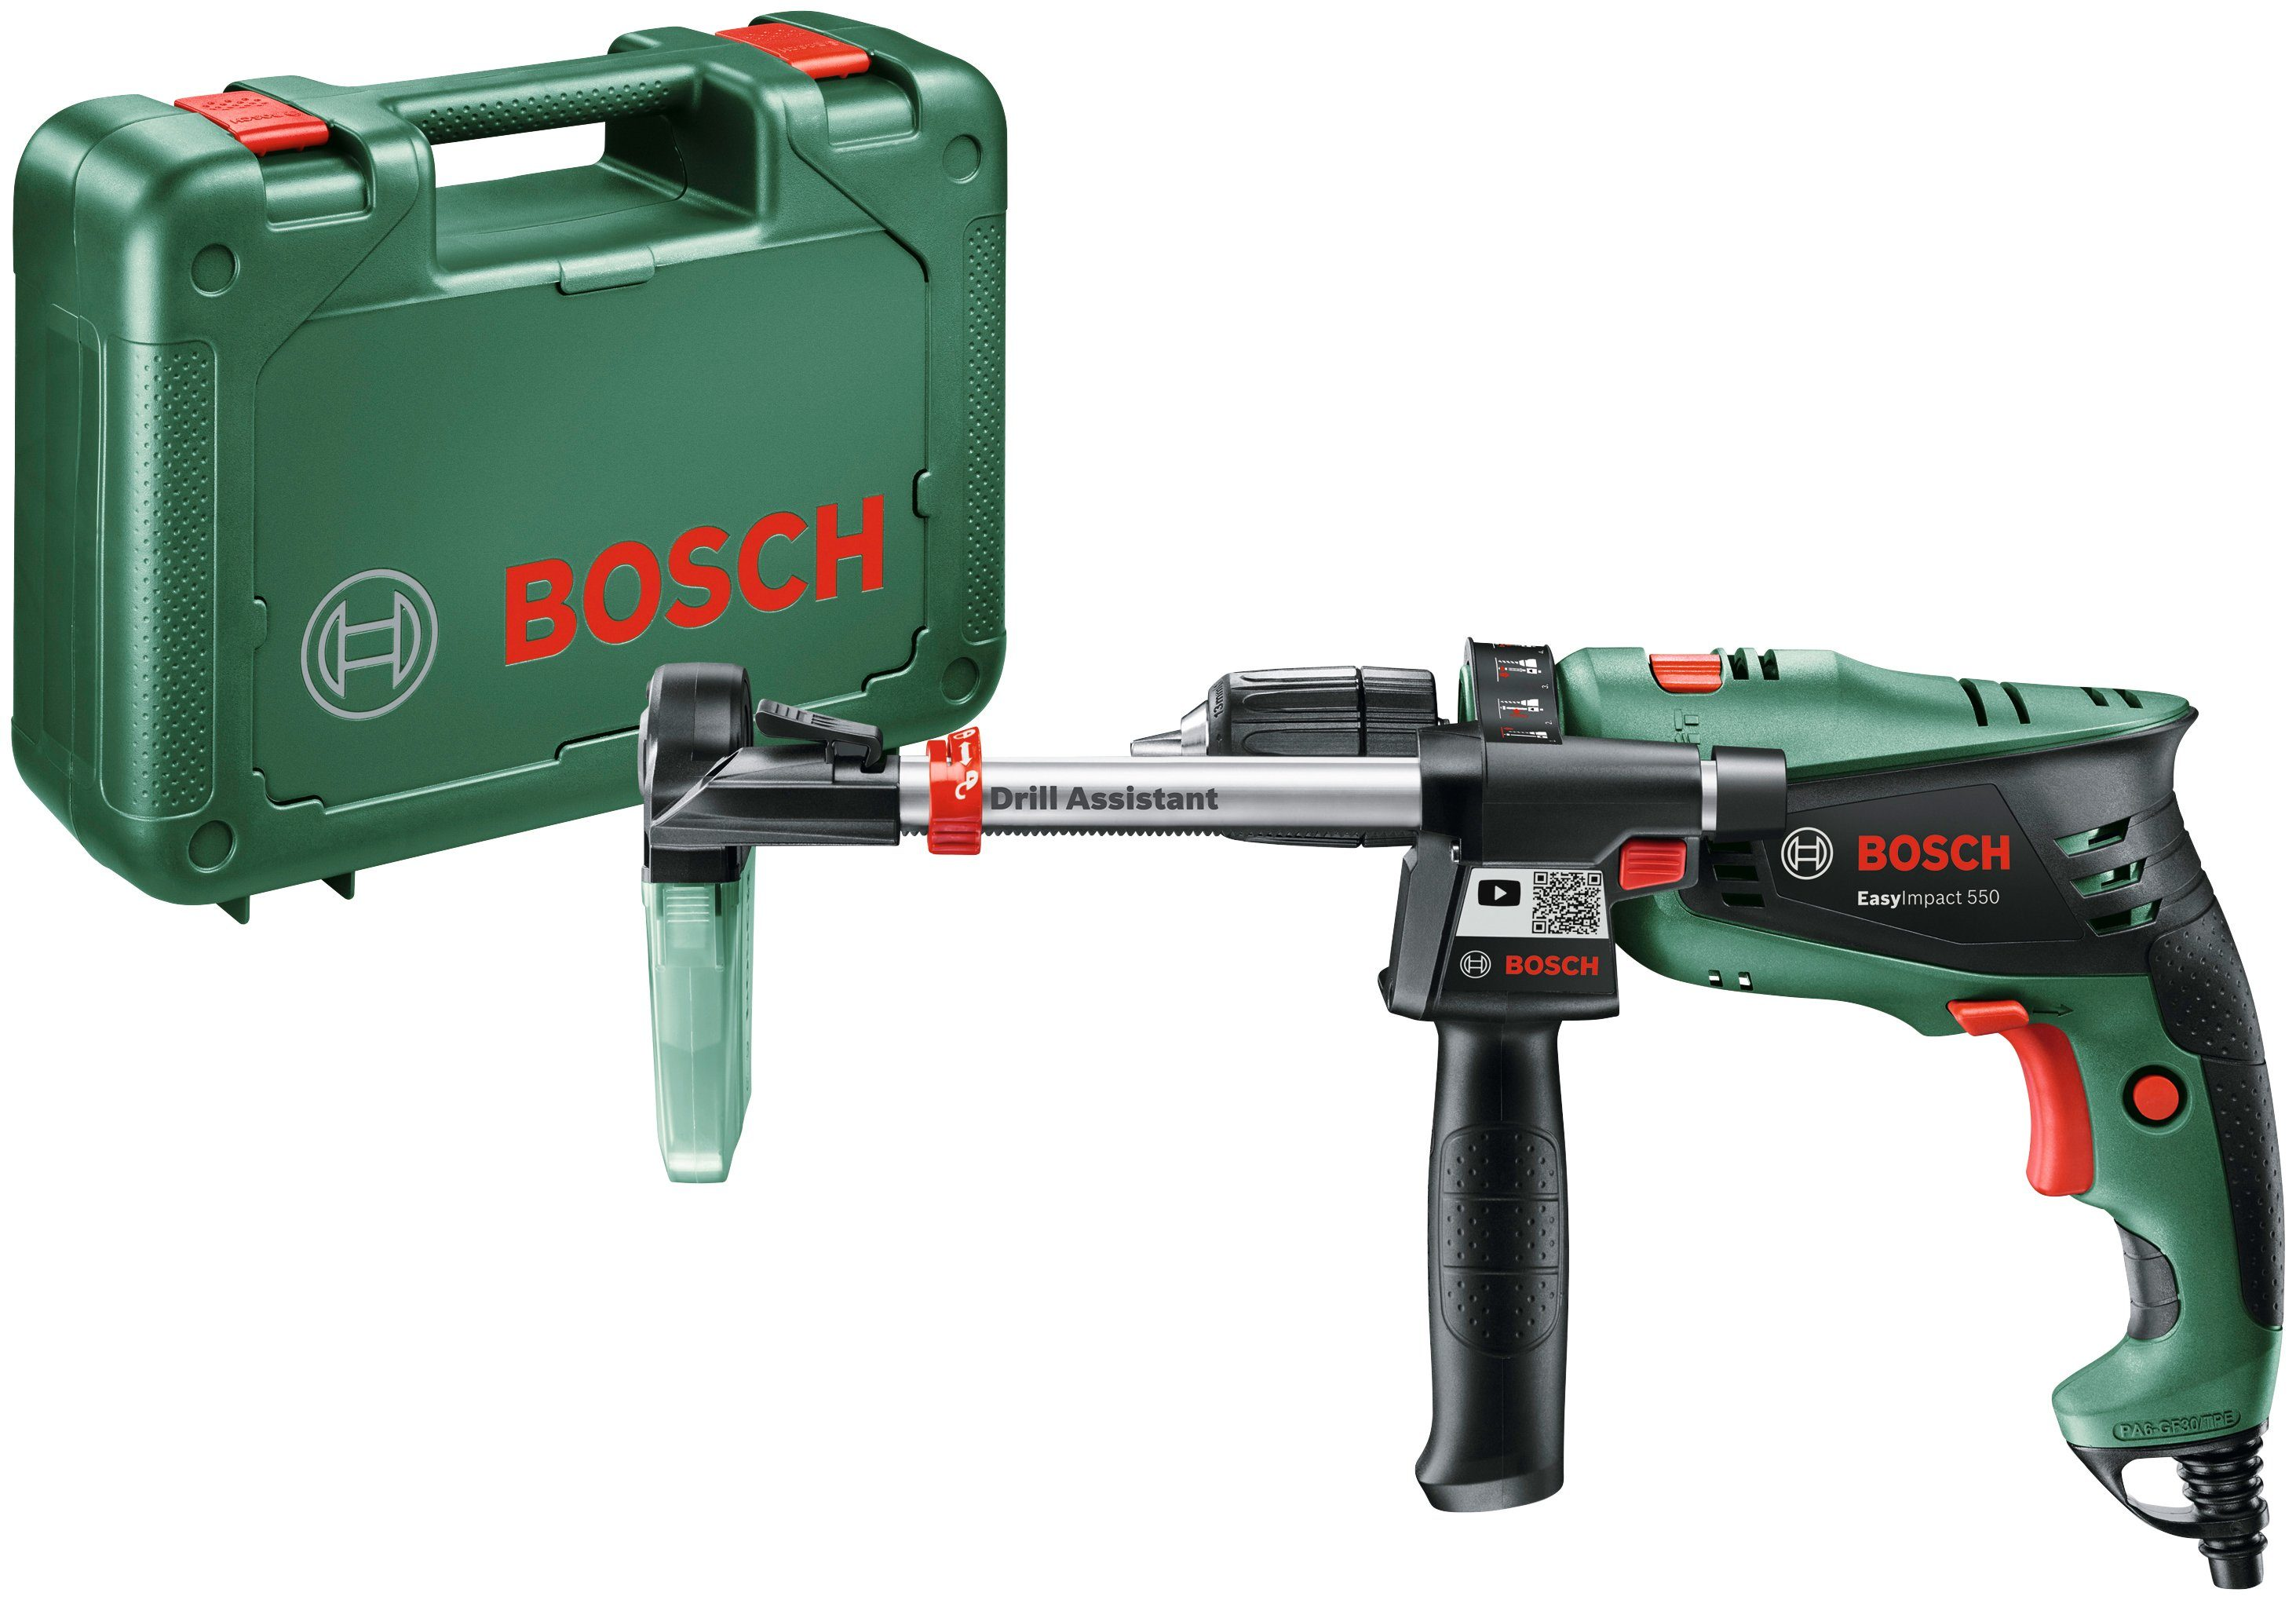 Bosch Schlagbohrmaschine EasyImpact 550